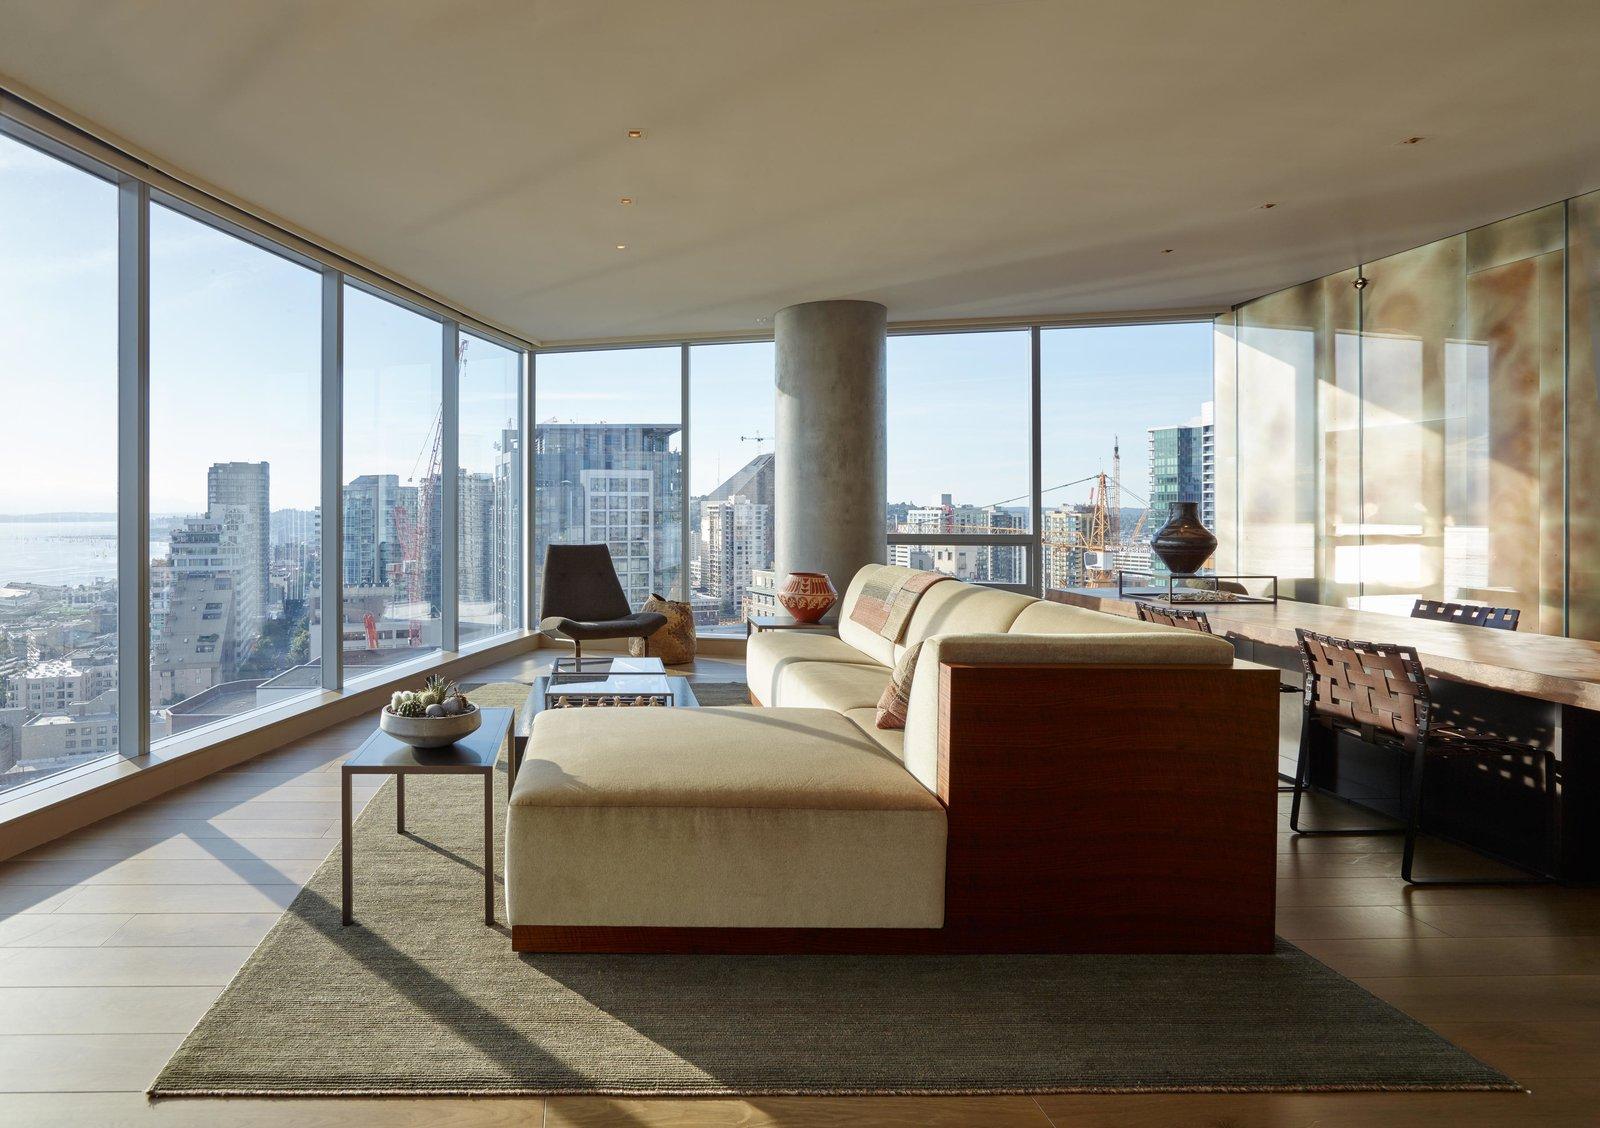 Living Room, Chair, Sectional, and Rug Floor Haven of Reflection   Olson Kundig  Haven of Reflection by Olson Kundig